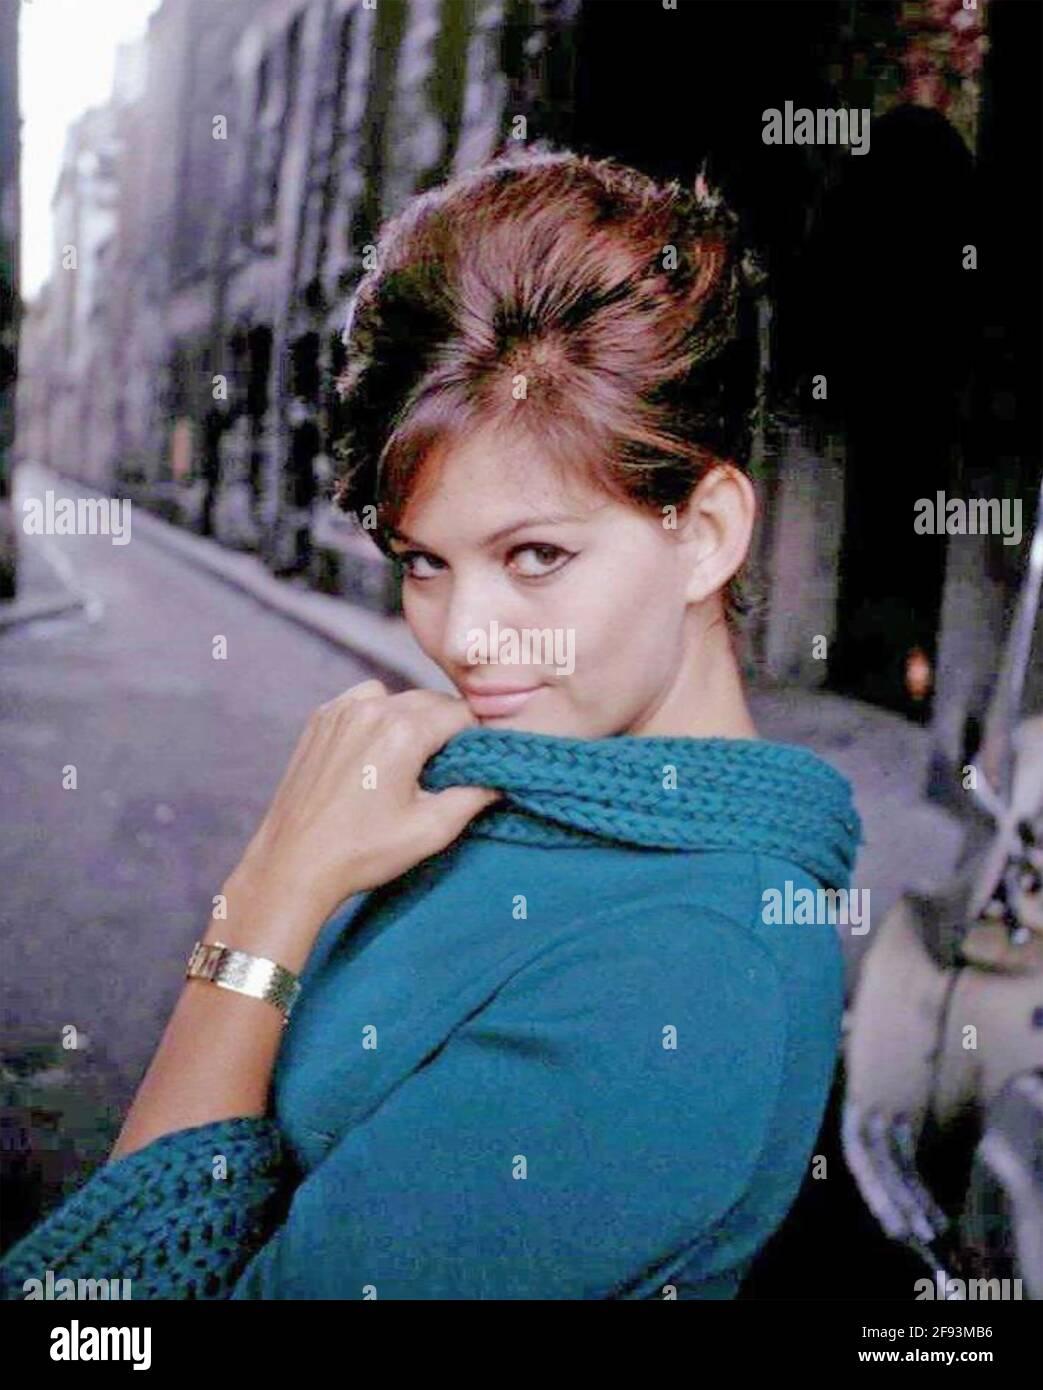 CLAUDIA CARDINALE italienische Schauspielerin ca. 1960 Stockfoto